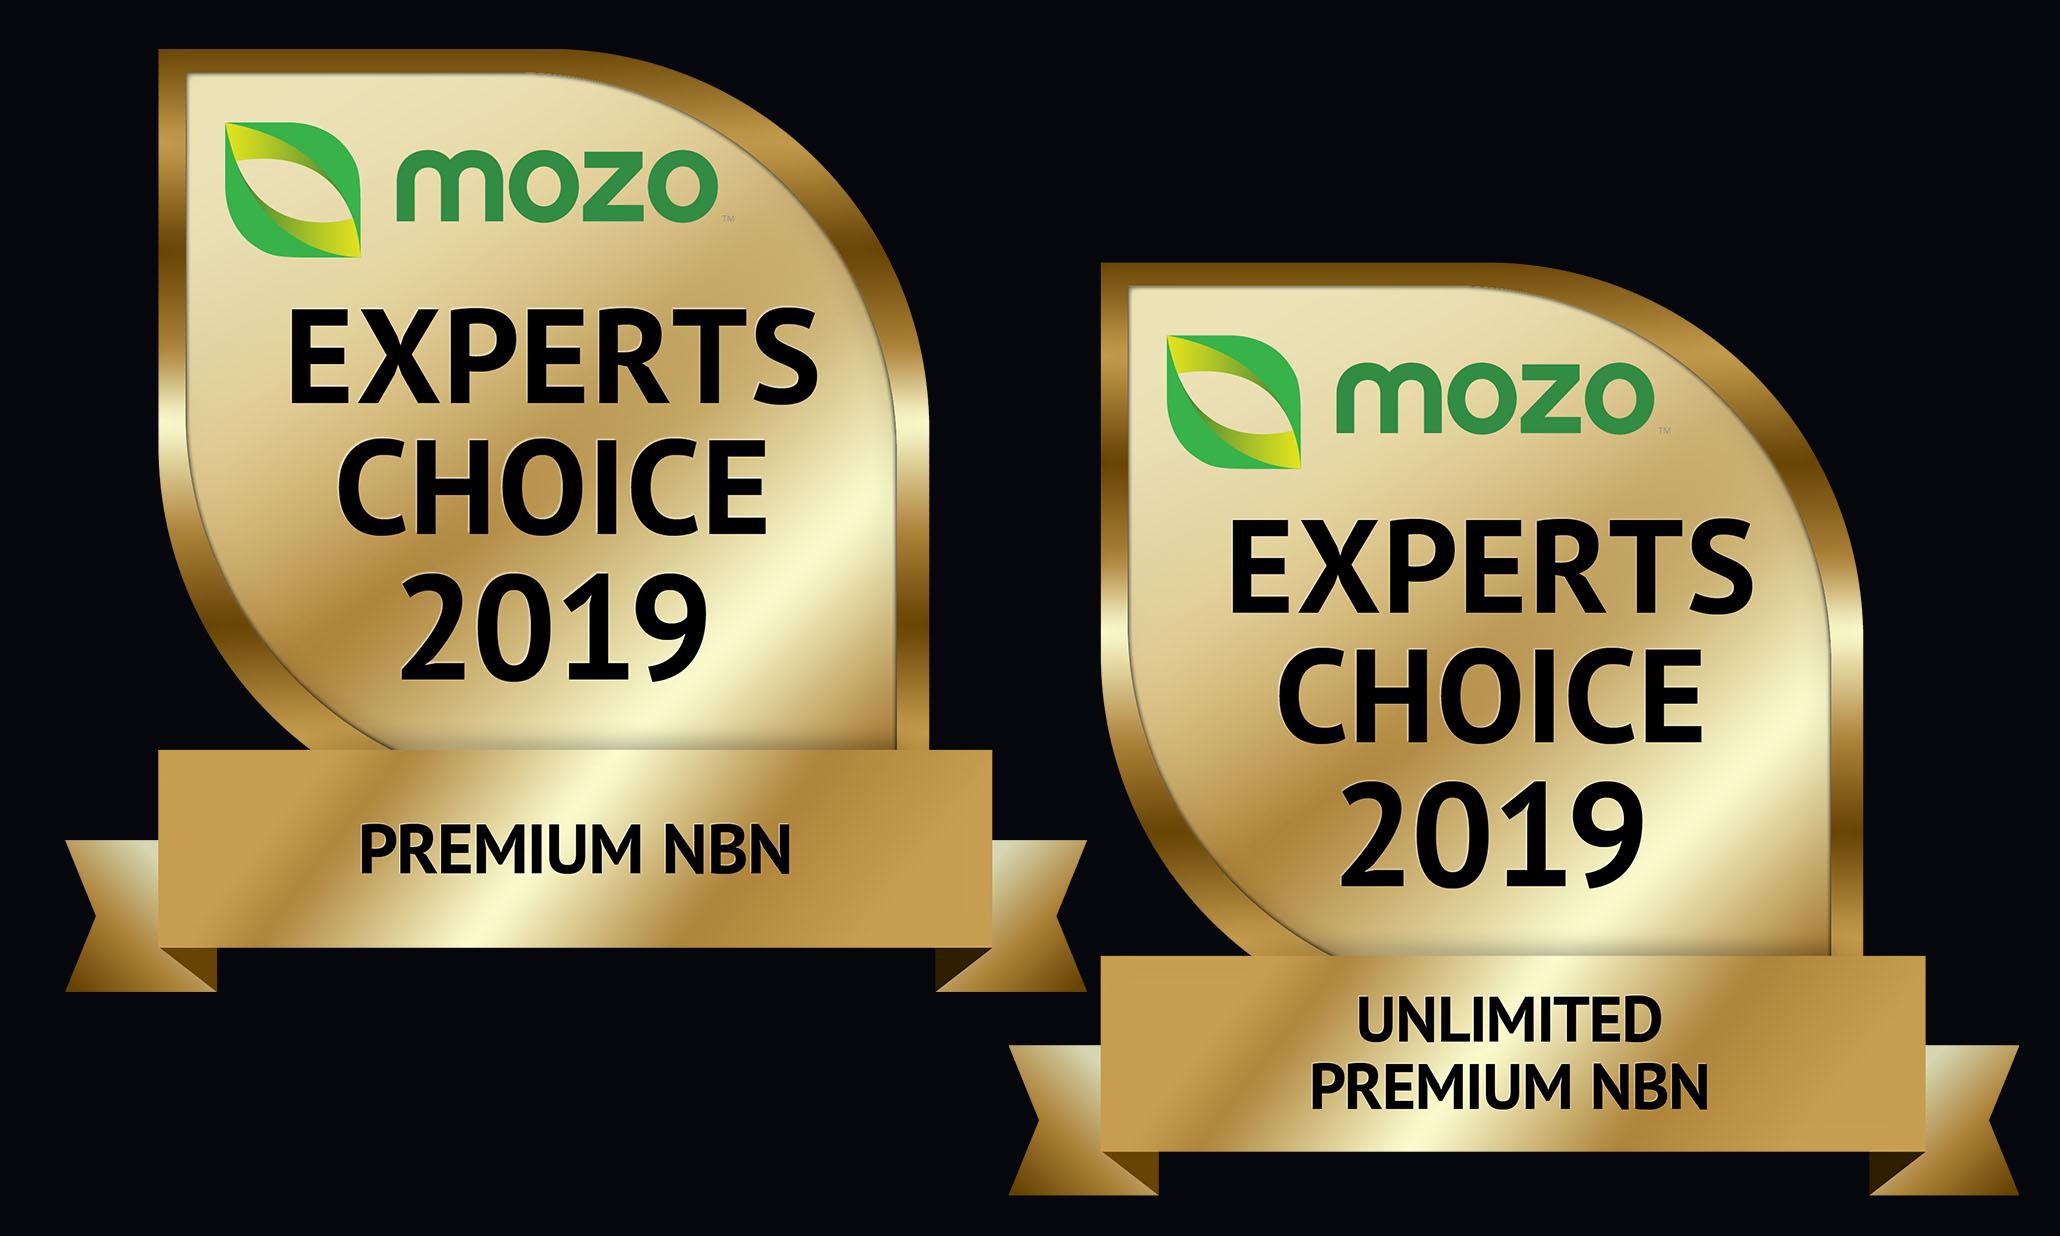 Mozo Experts Choice 2019 Award